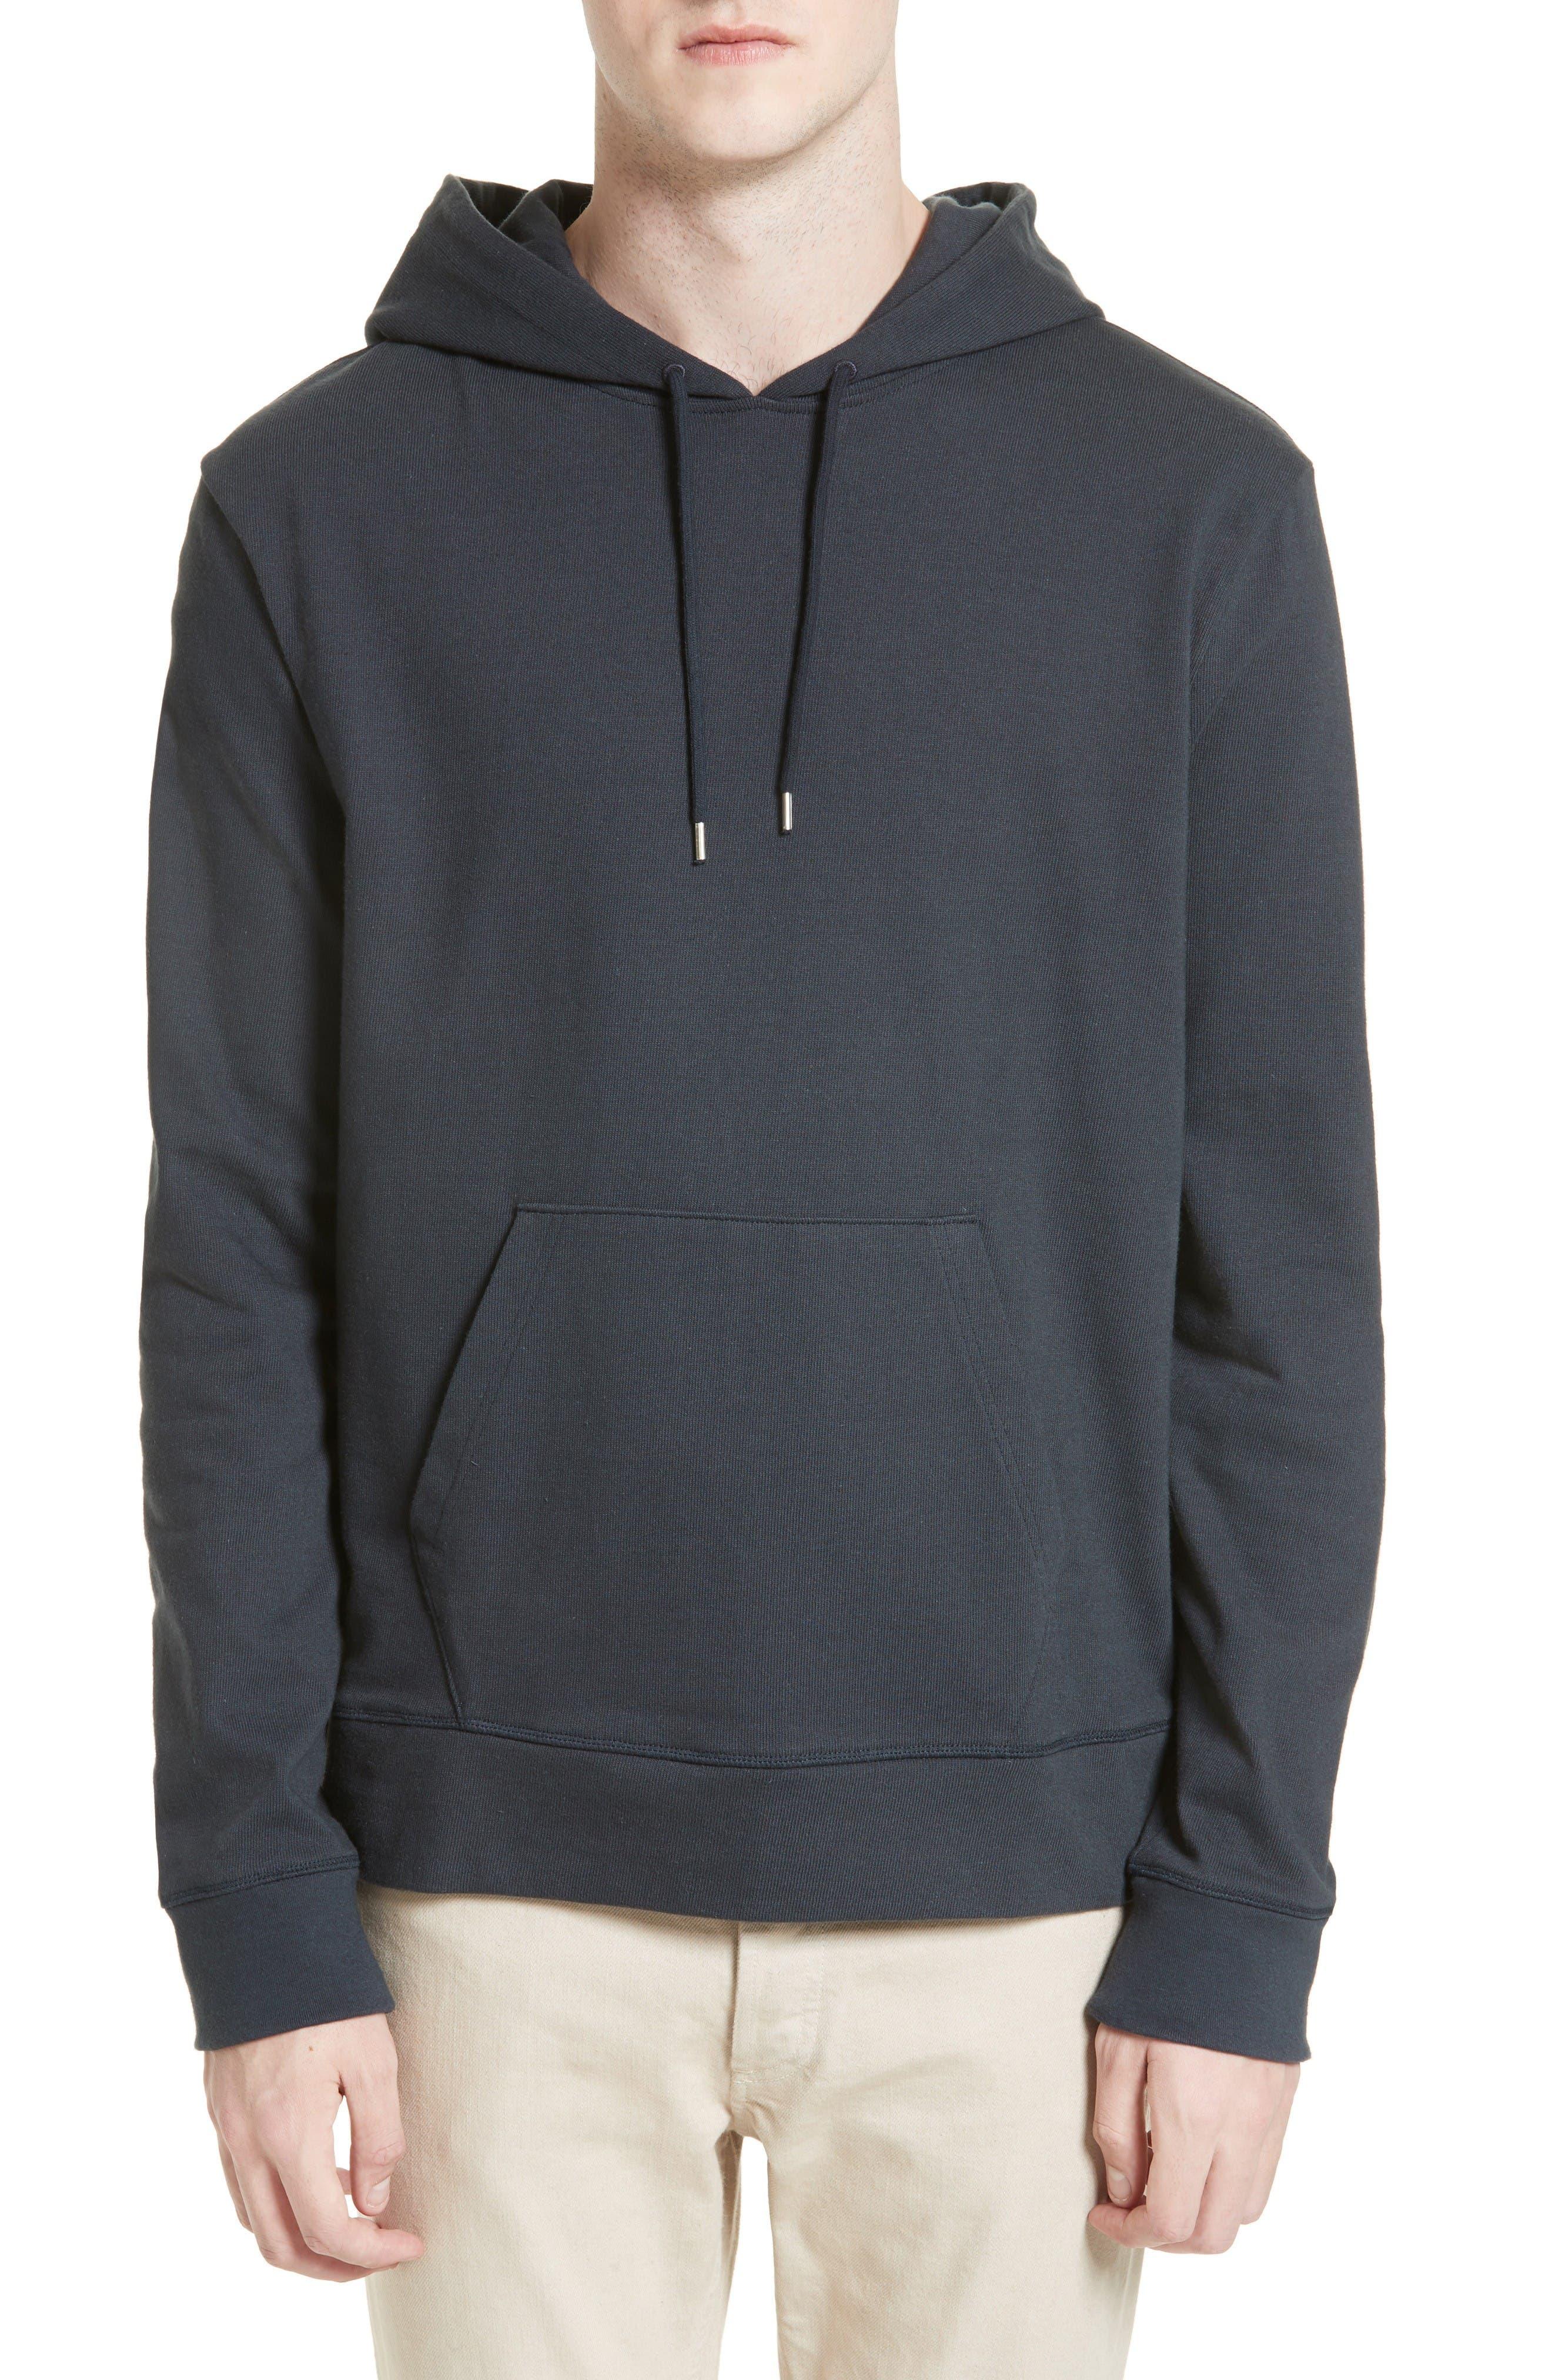 Brody Hooded Sweatshirt,                         Main,                         color, Grey